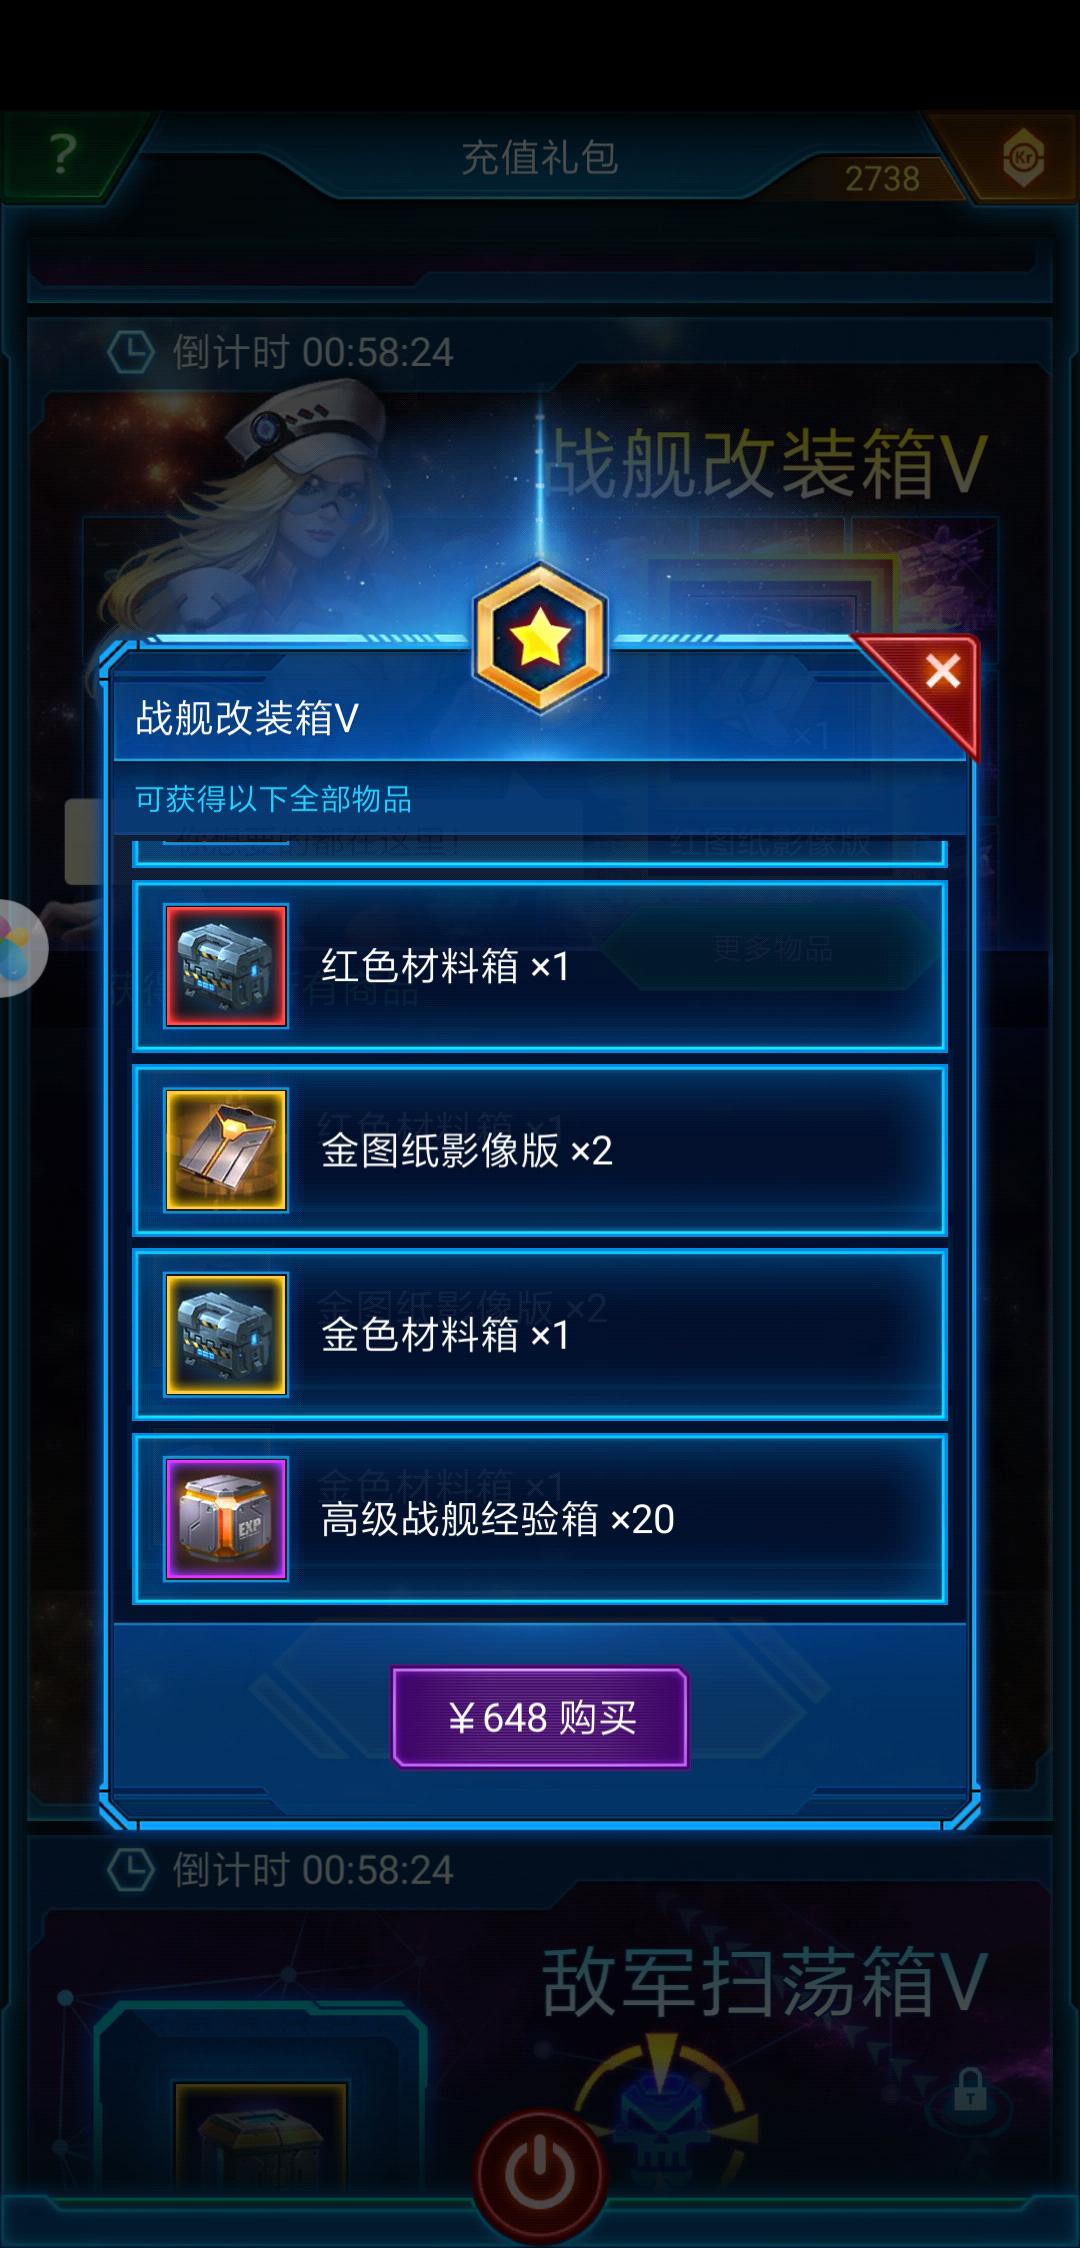 Screenshot_2018-11-18-11-02-31-755_com.jedigames.p16s.huawei.png